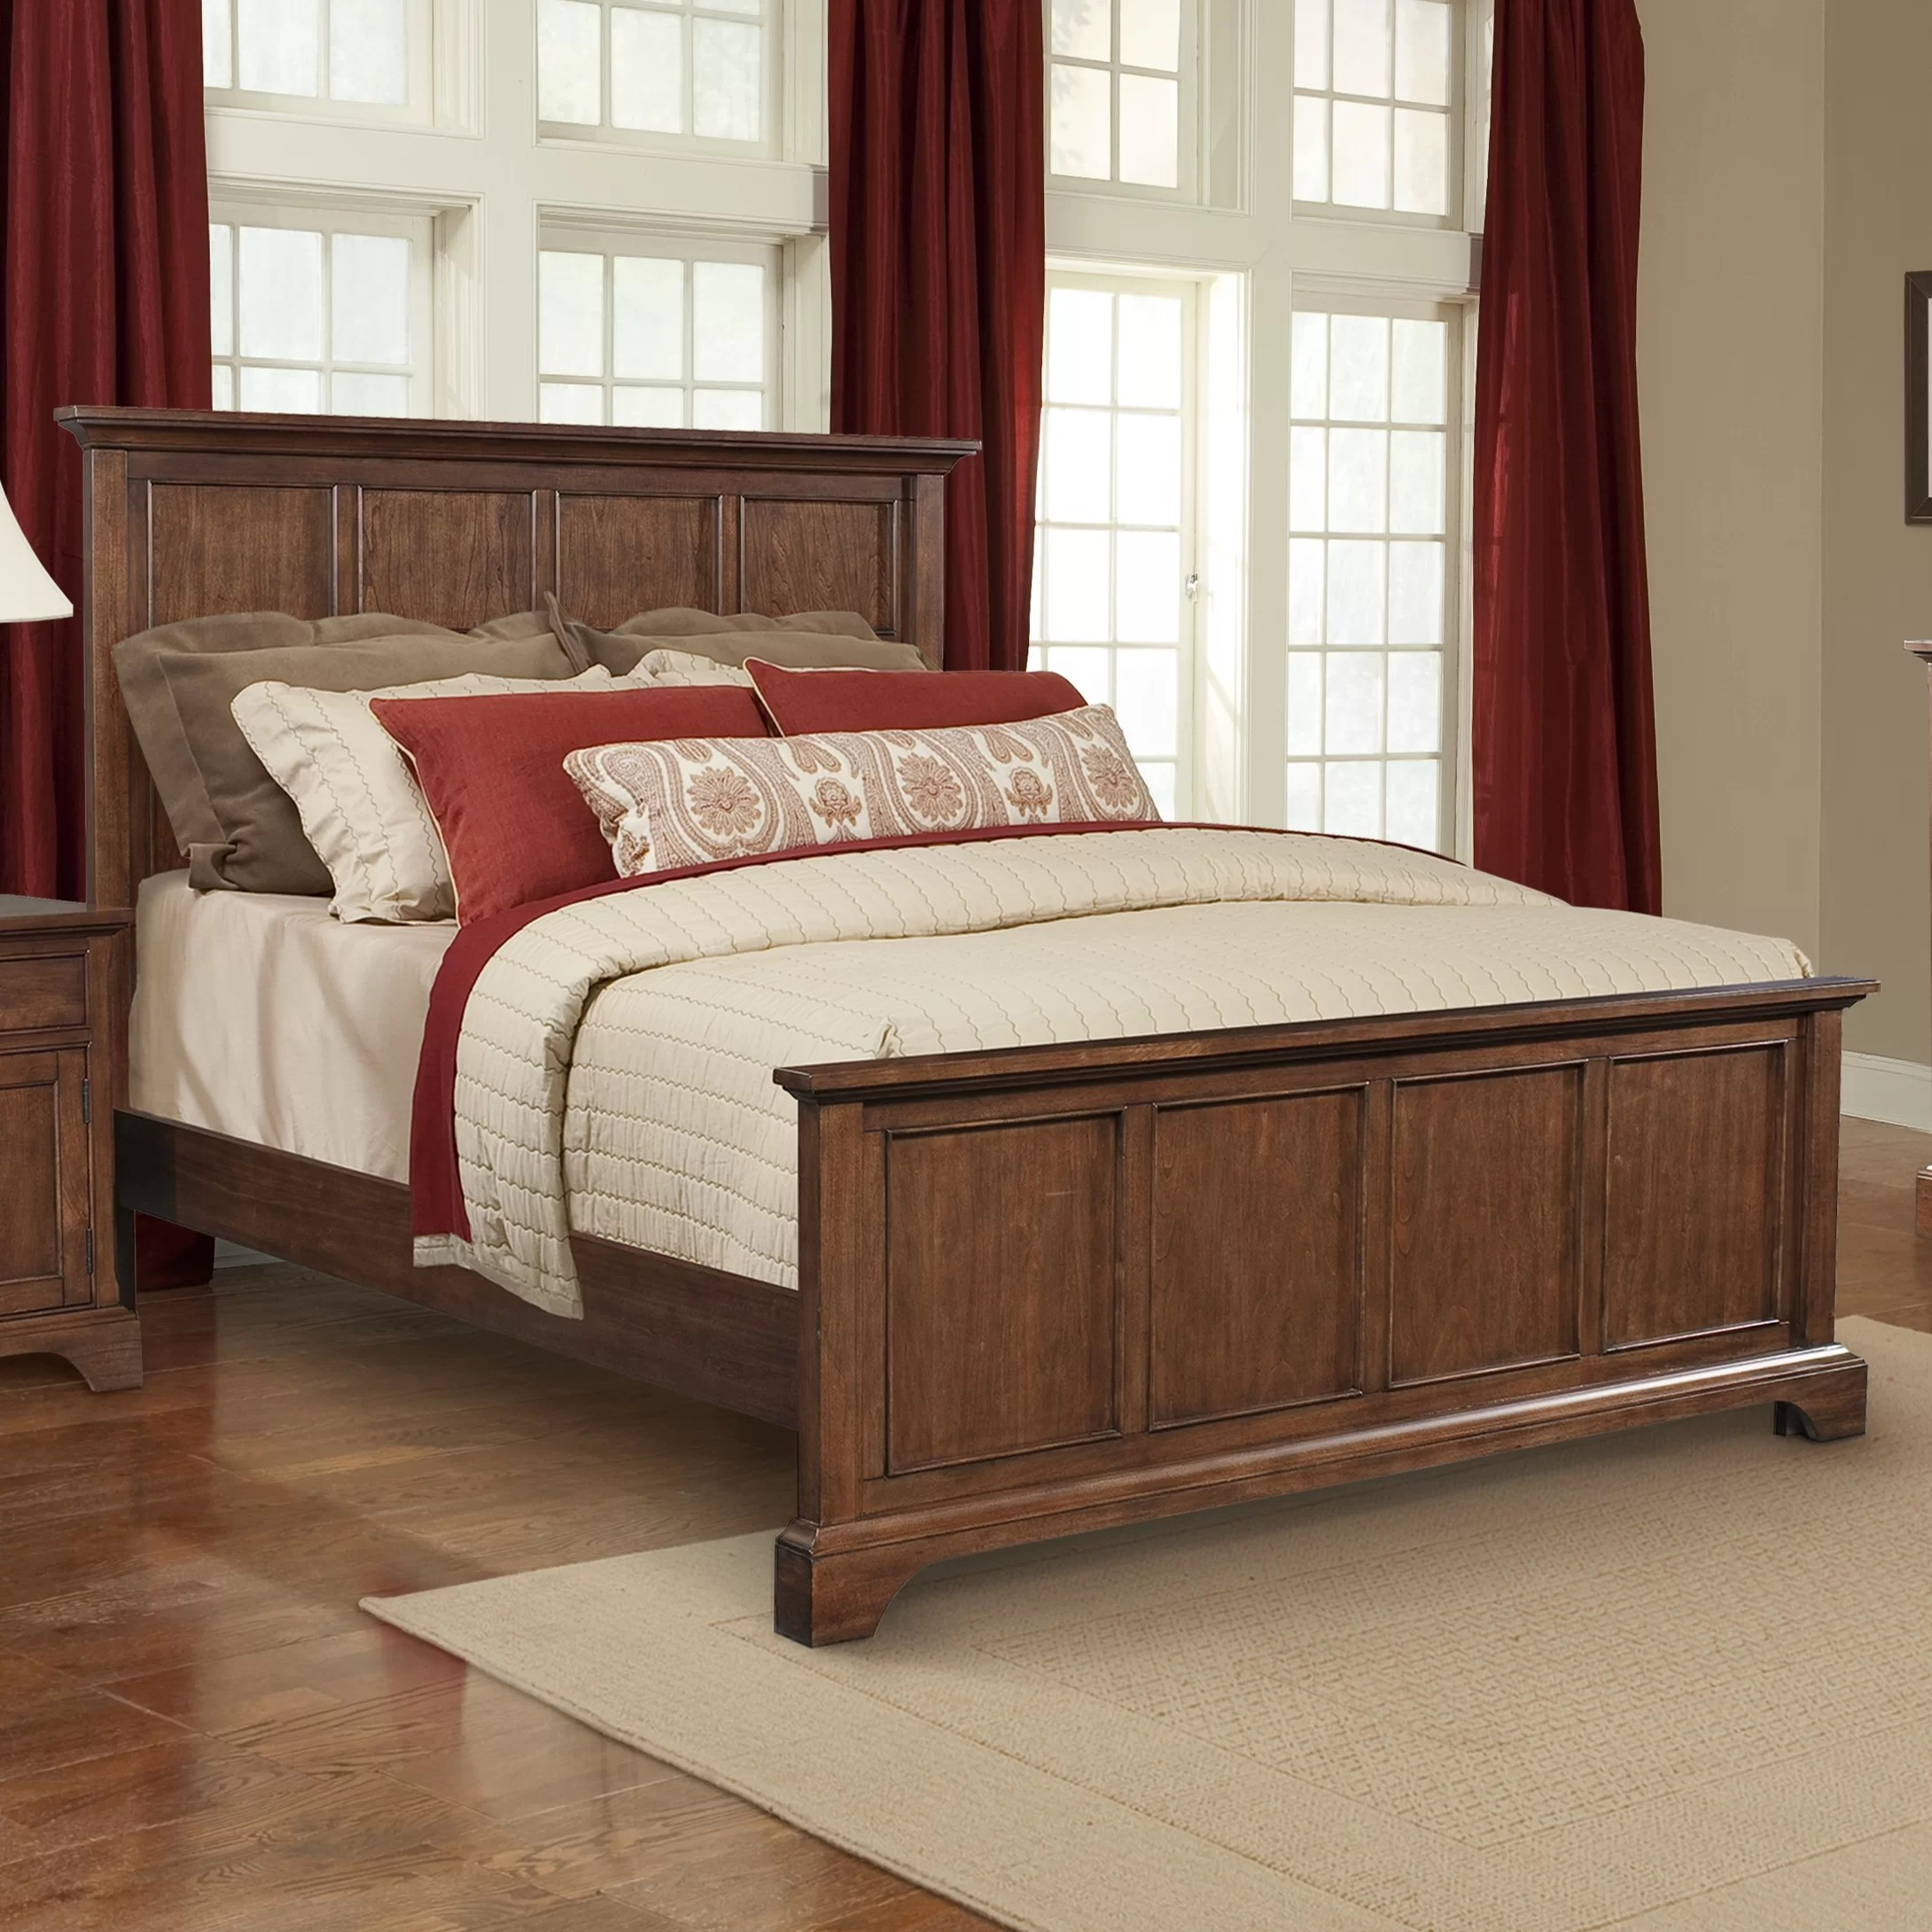 bedroom chair wayfair office swivel covers cresent furniture retreat cherry queen panel customizable